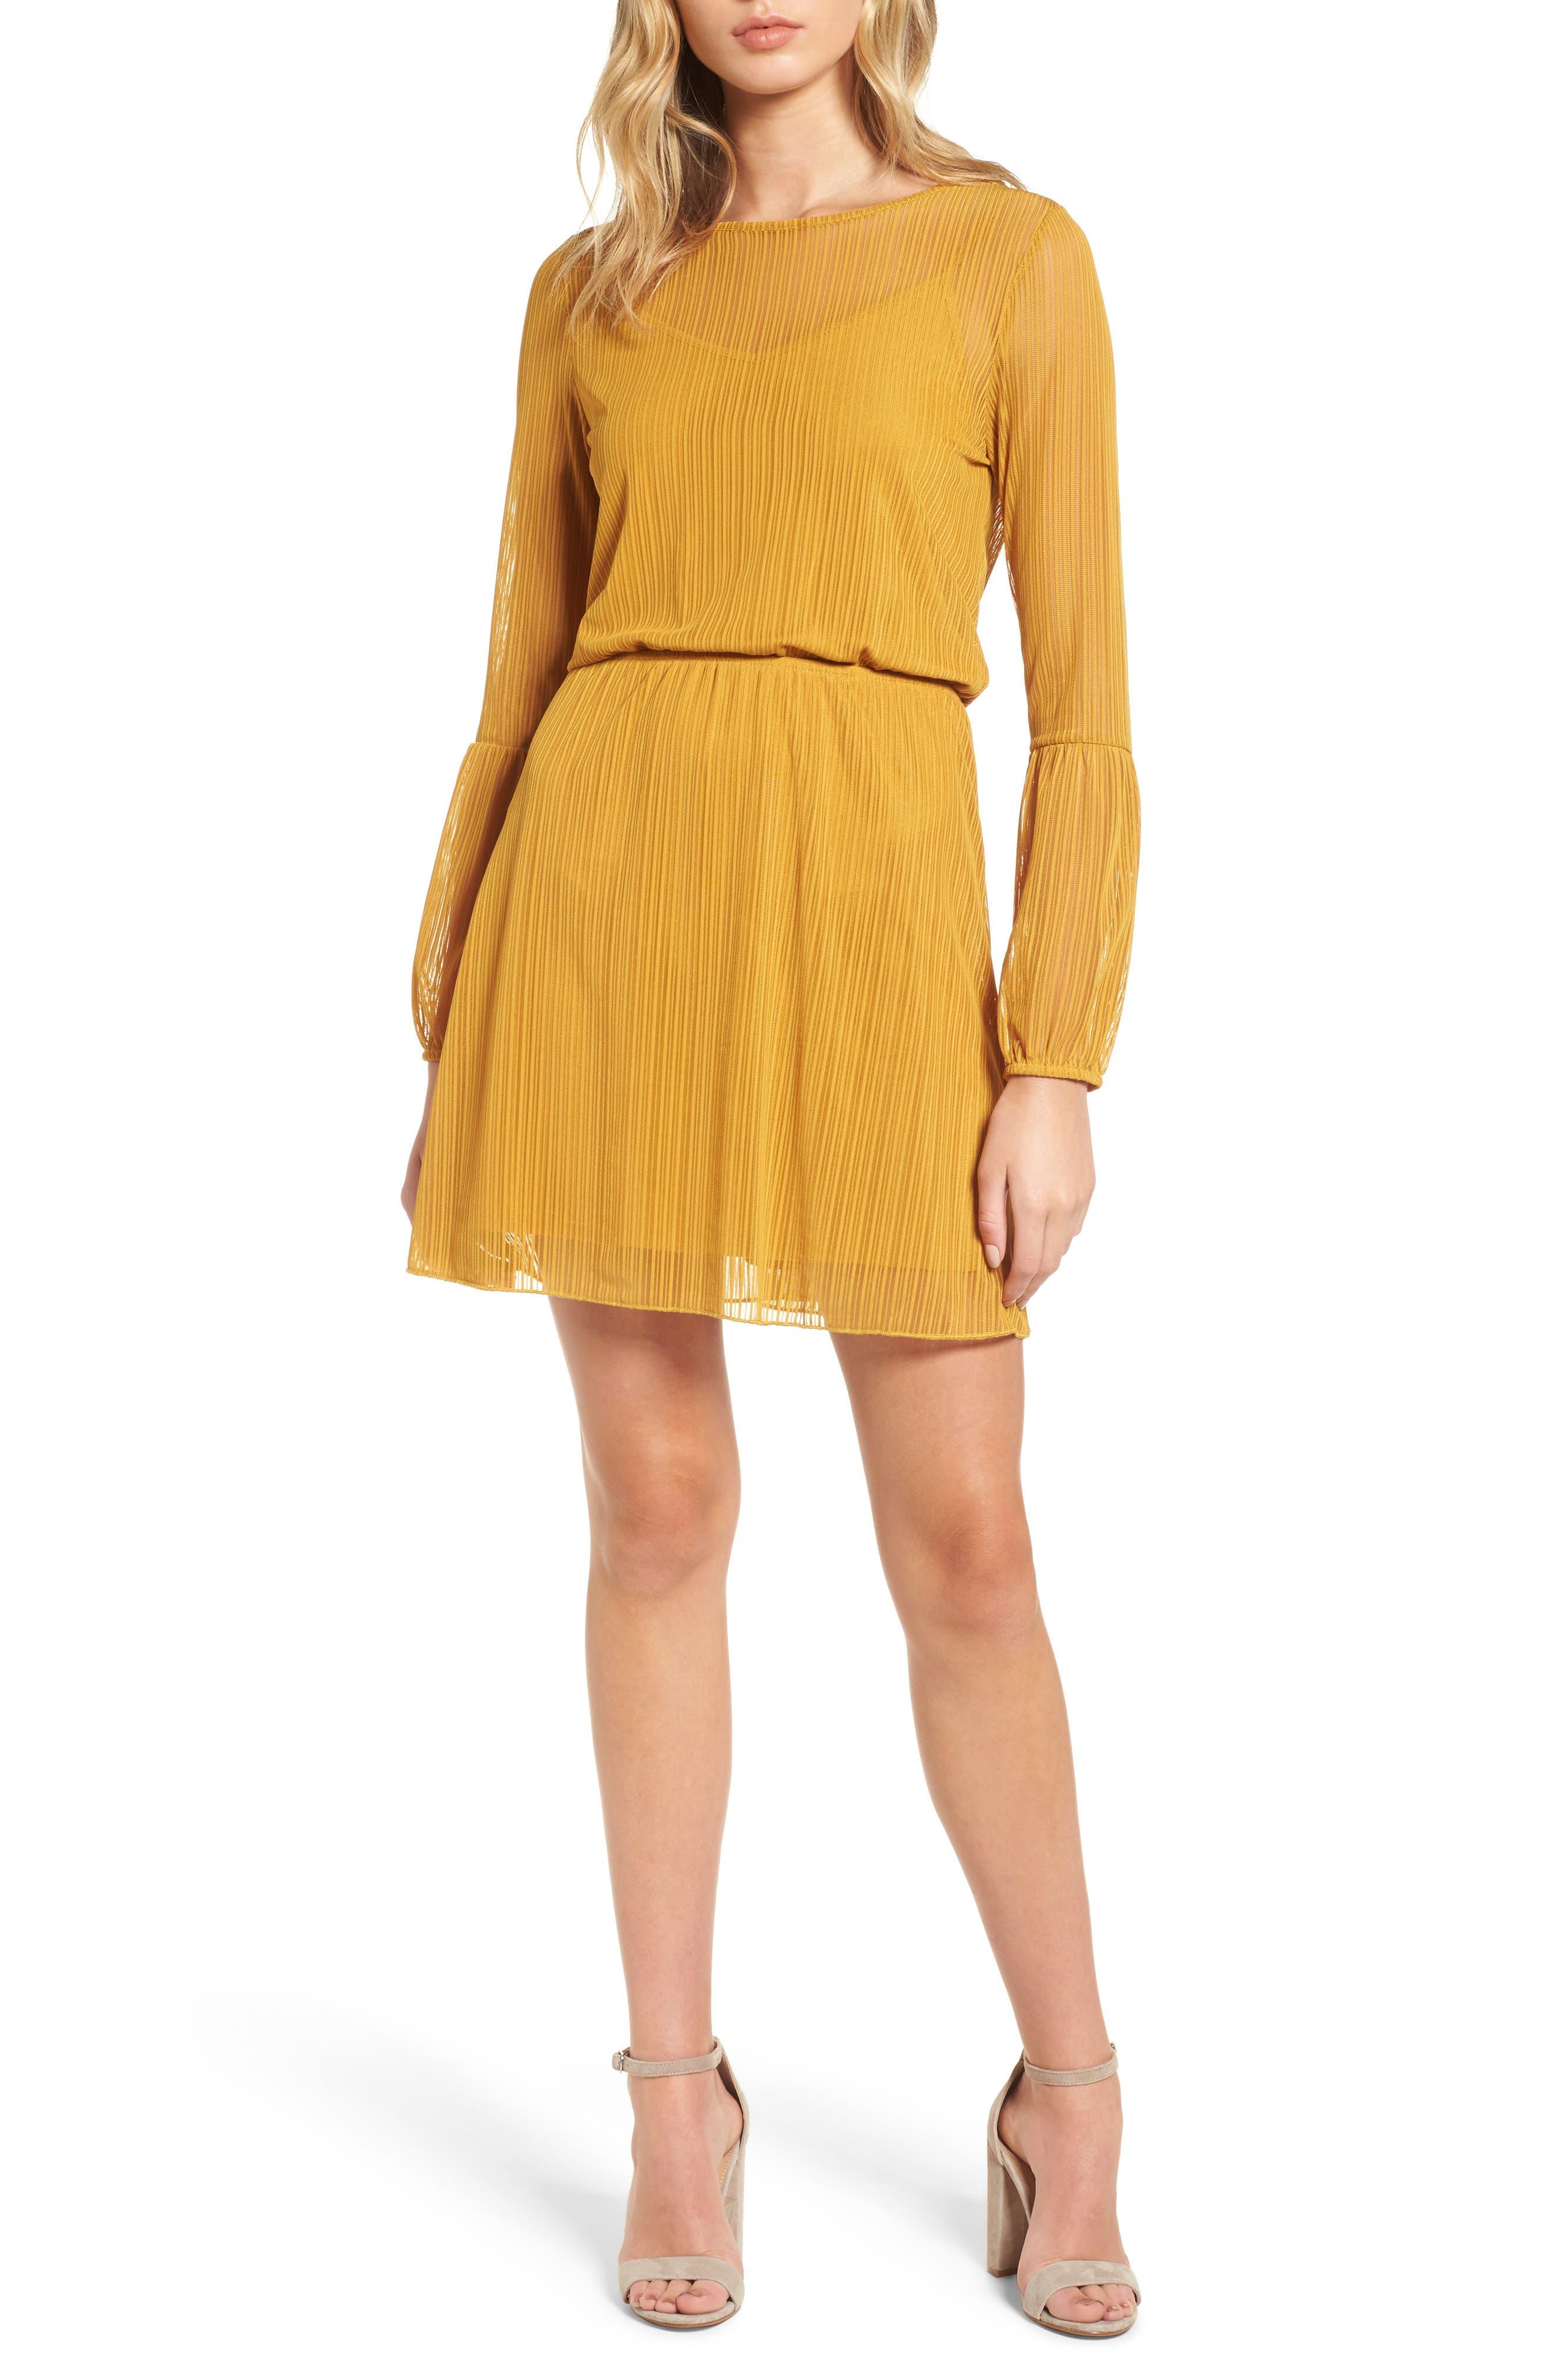 Blouson Dress,                         Main,                         color, Tan Mustard